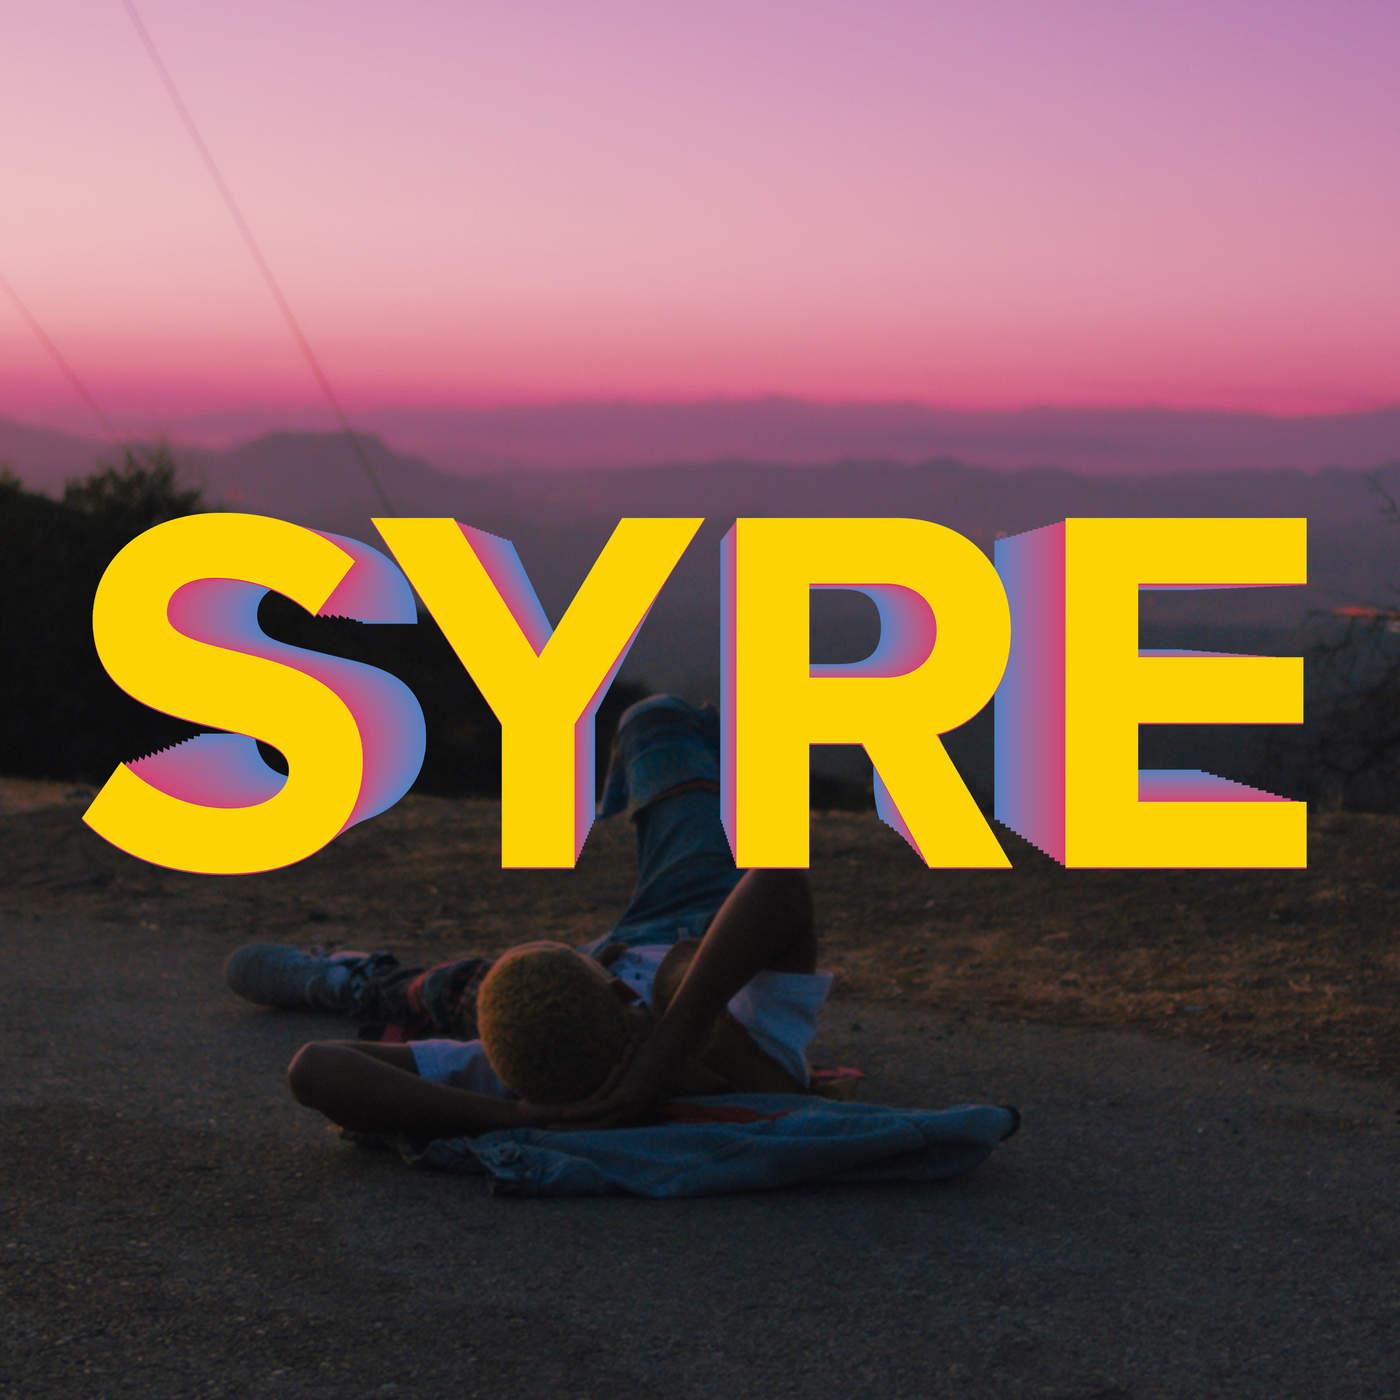 Jaden smith syre album zip free download unlimitdownloads jaden smith syre album zip free download malvernweather Images